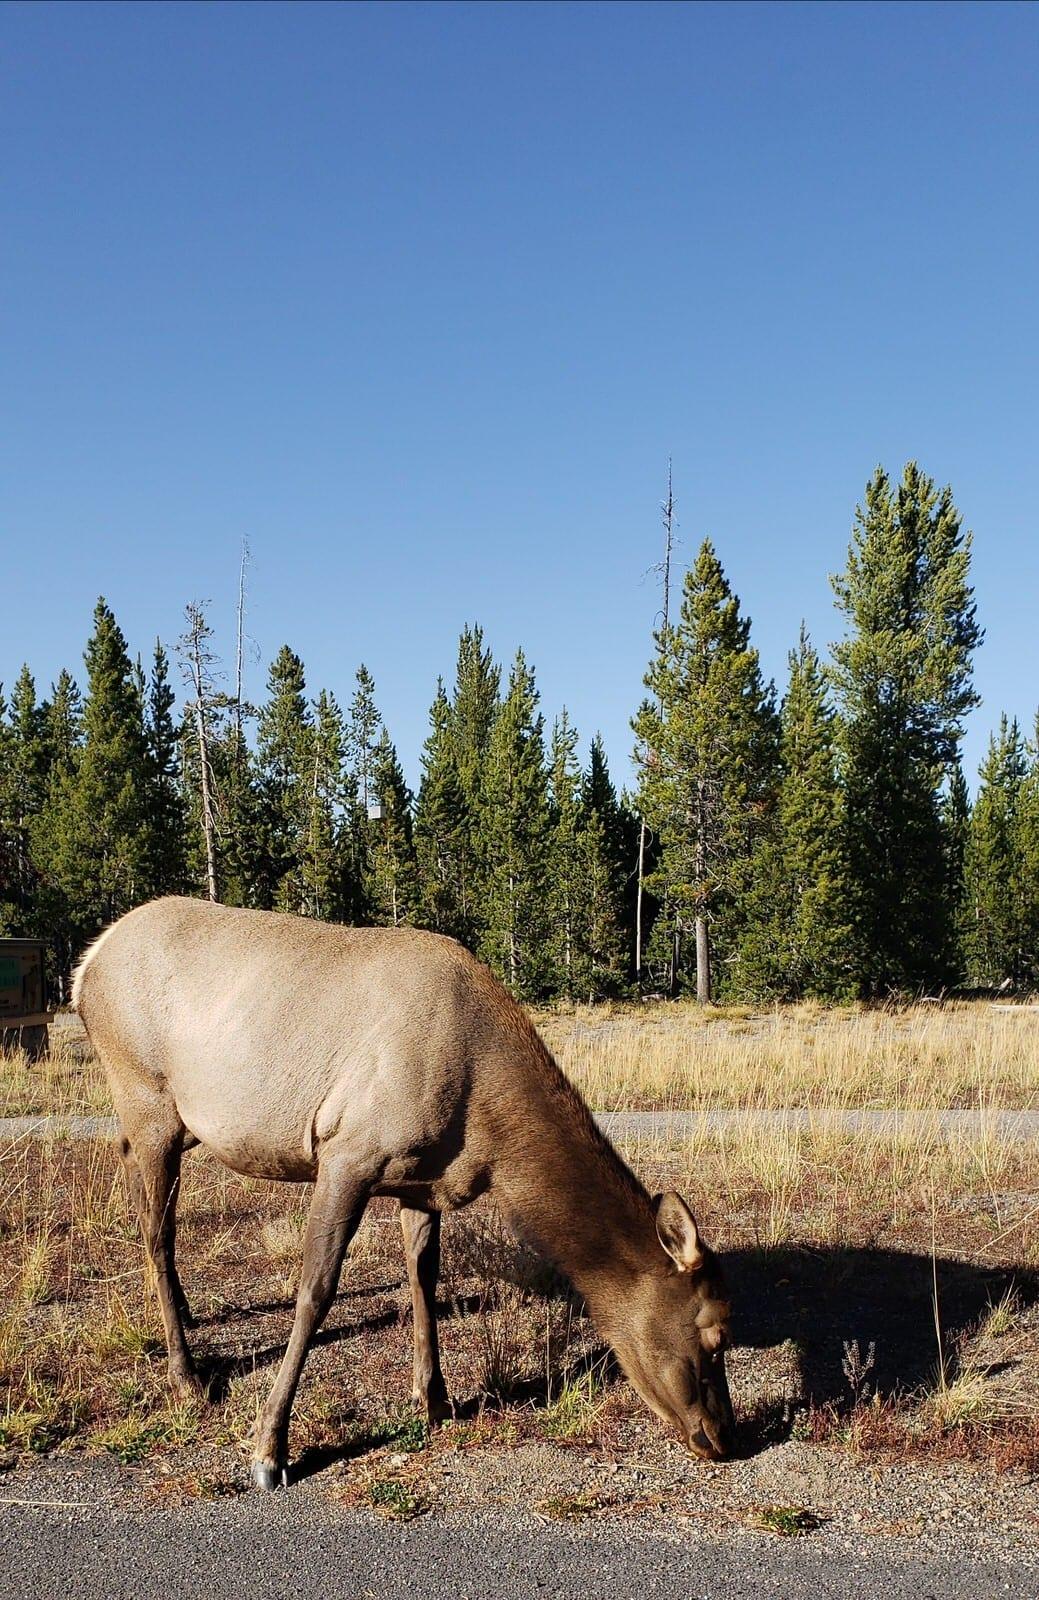 moose at grant village yellowstone national park